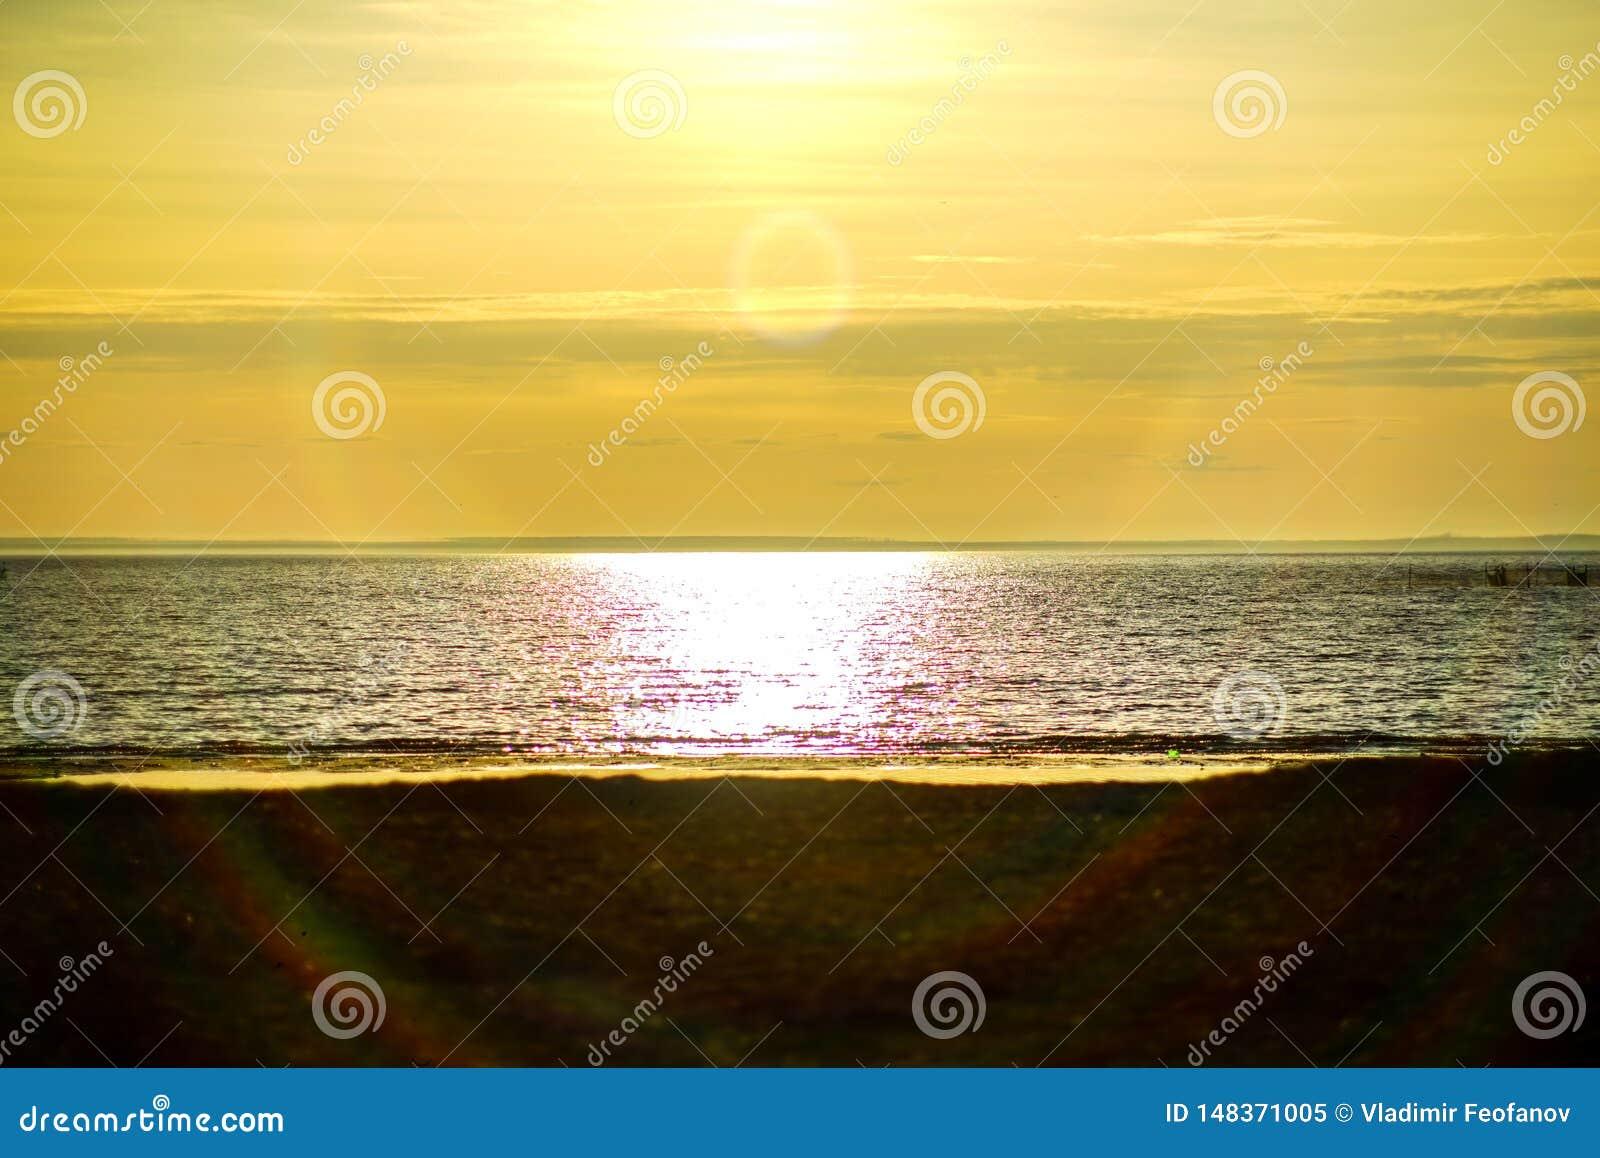 Заход солнца океана, моря на предпосылке солнца идя за горизонтом пляж и чудесное